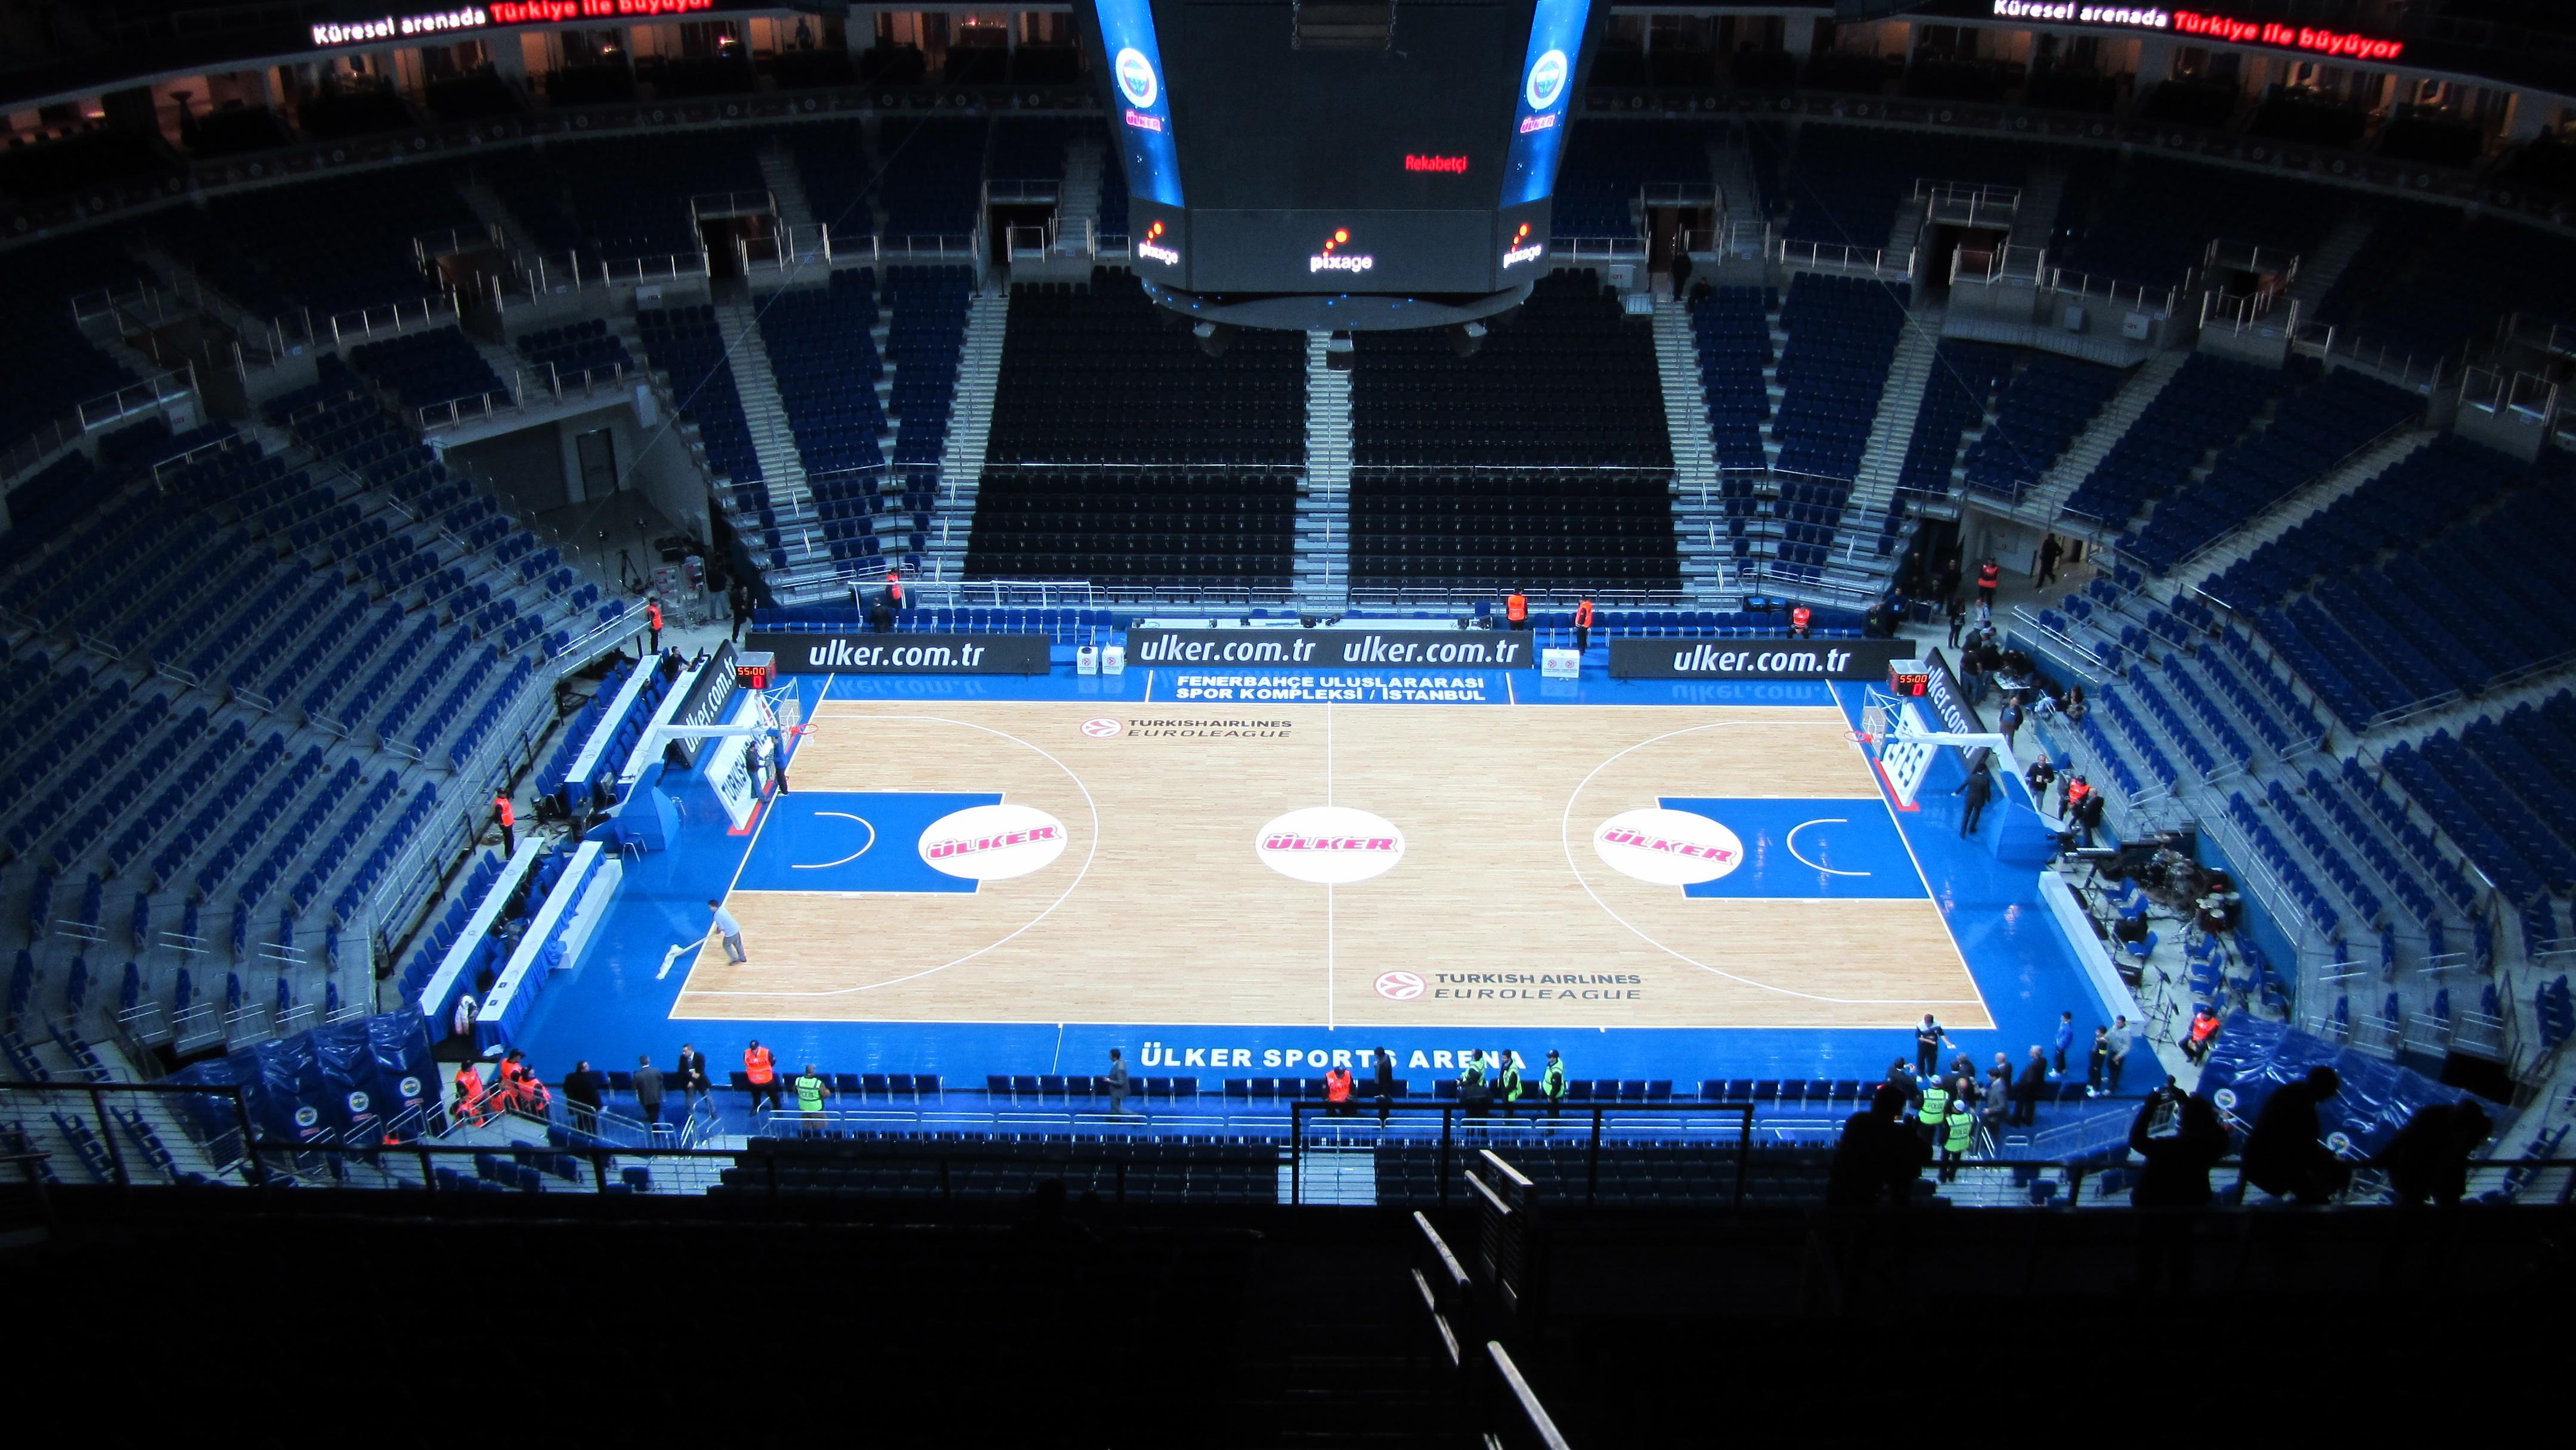 File:Ülker Sports Arena bowl.jpg - Wikimedia Commons